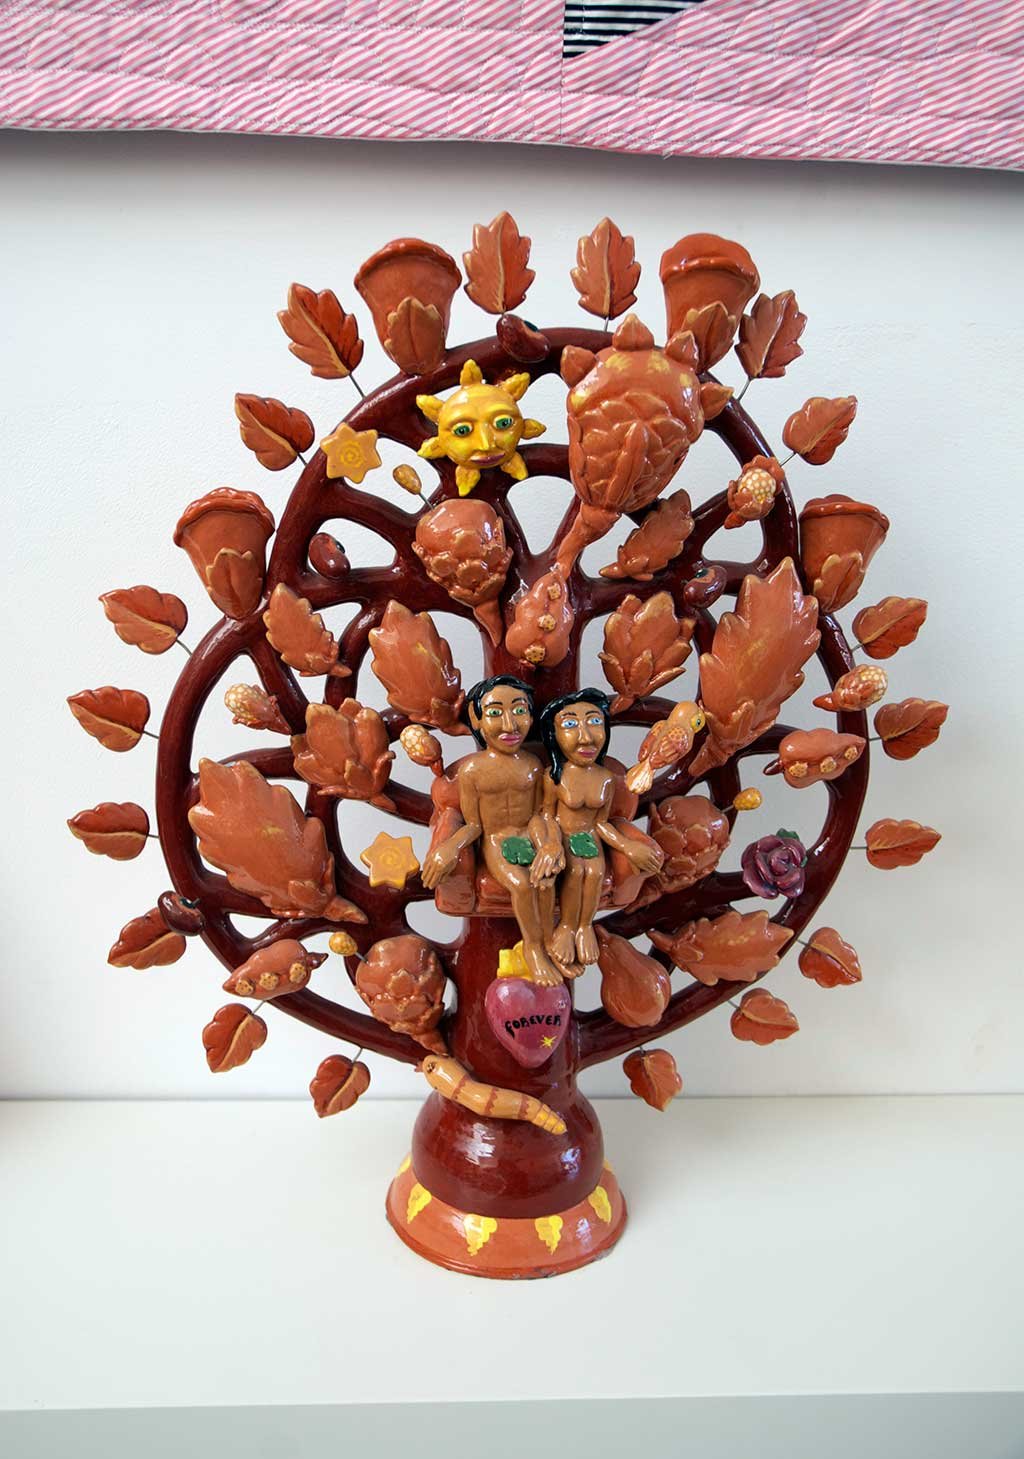 David Gurney, Tree of Life Grasshopper, 2008